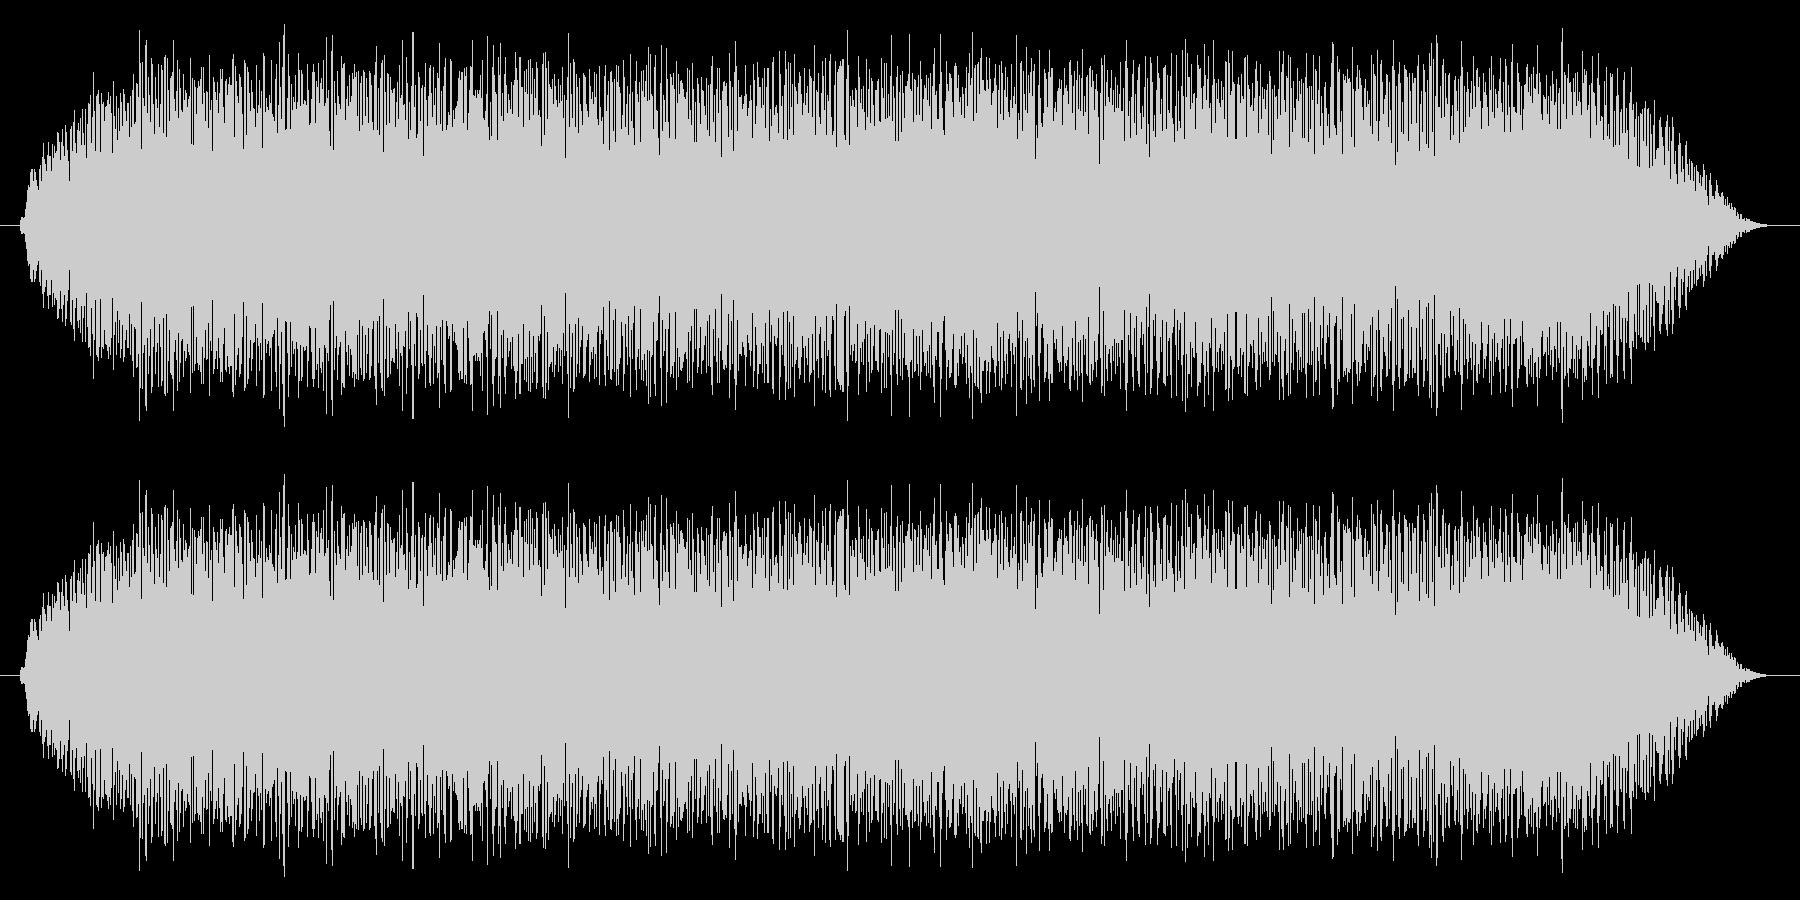 SNES レース02-04(スターティンの未再生の波形